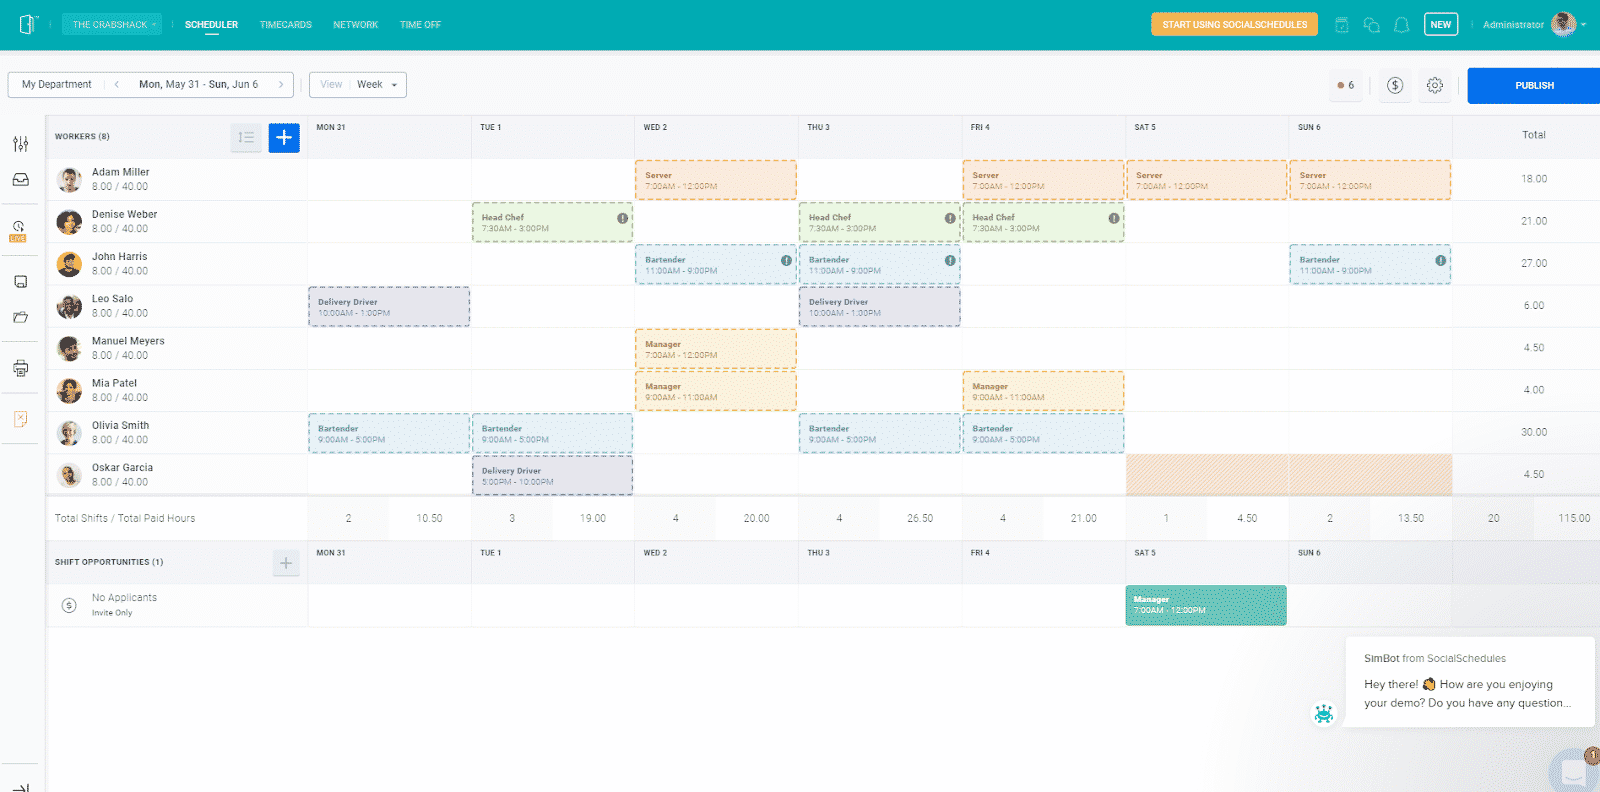 SocialSchedules Scheduling Software